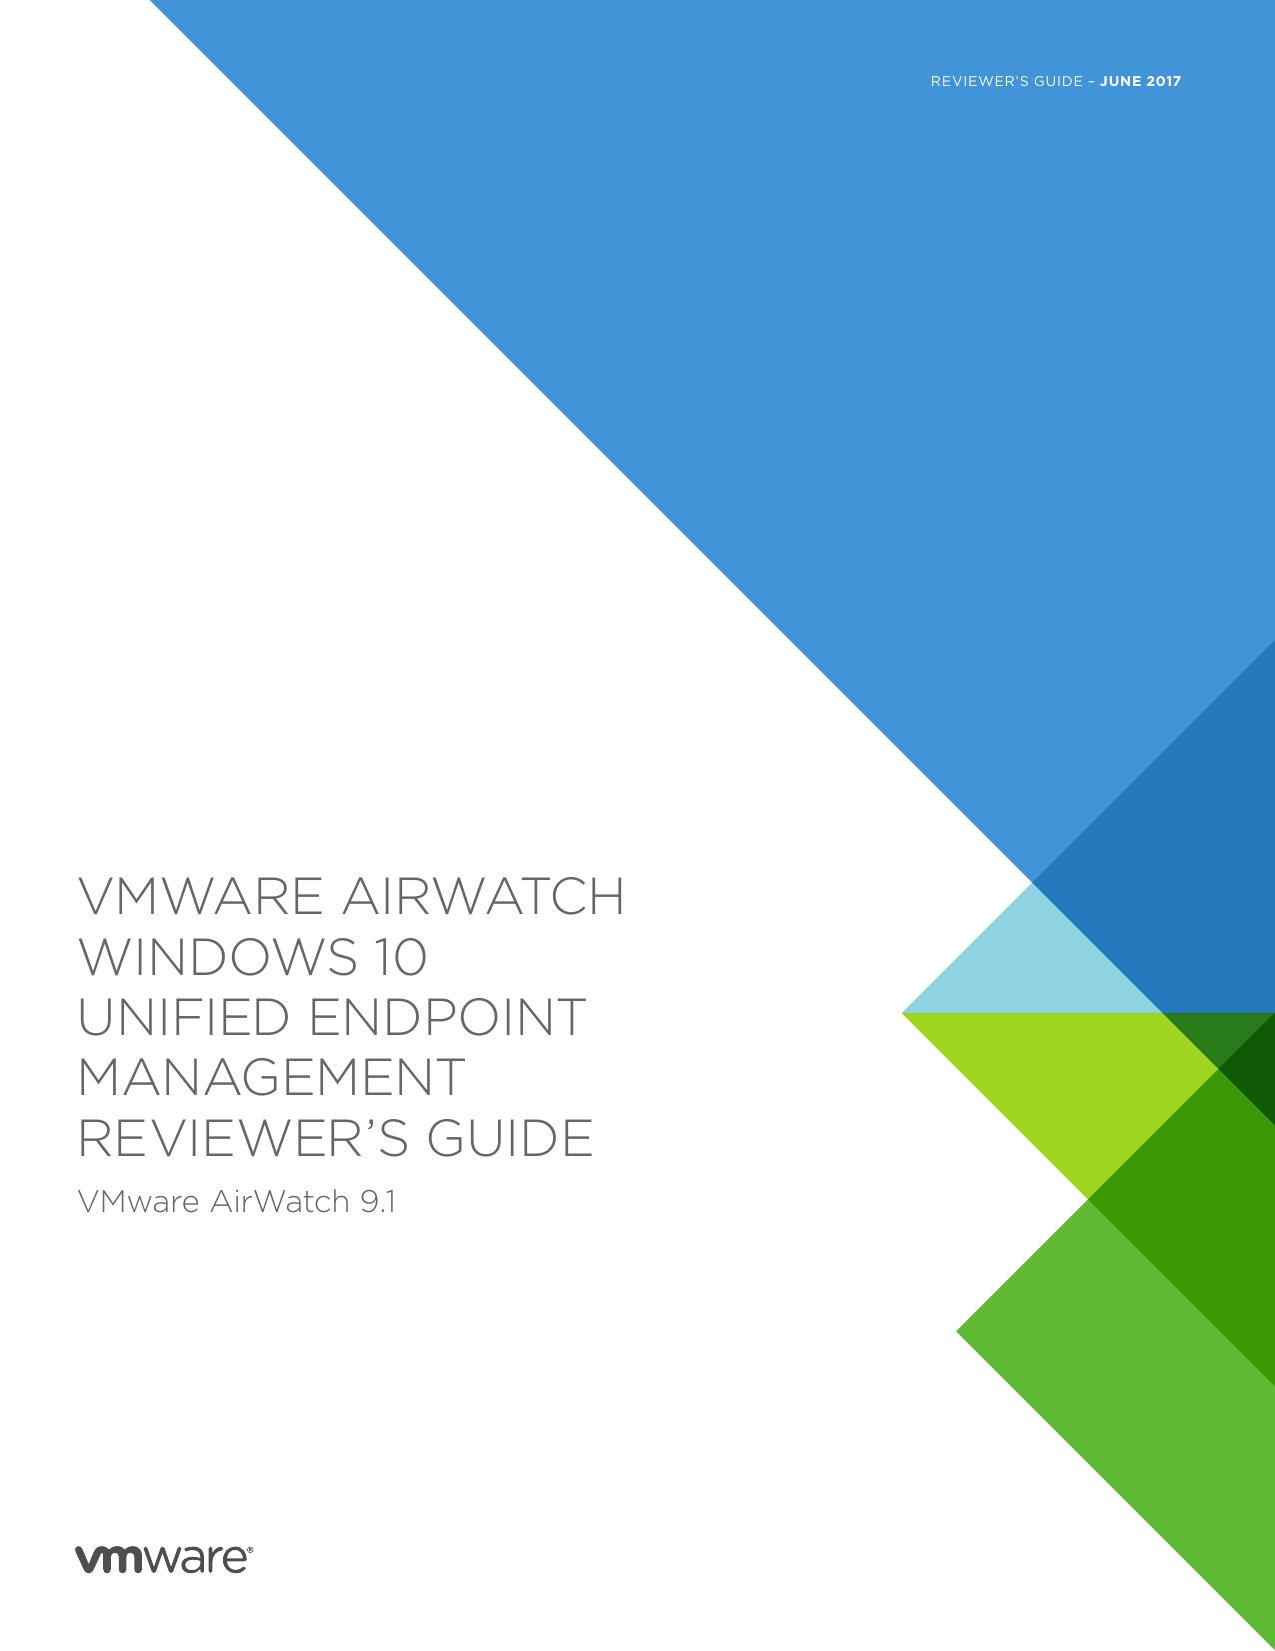 VMware AirWatch Windows 10 Unified Endpoint Management